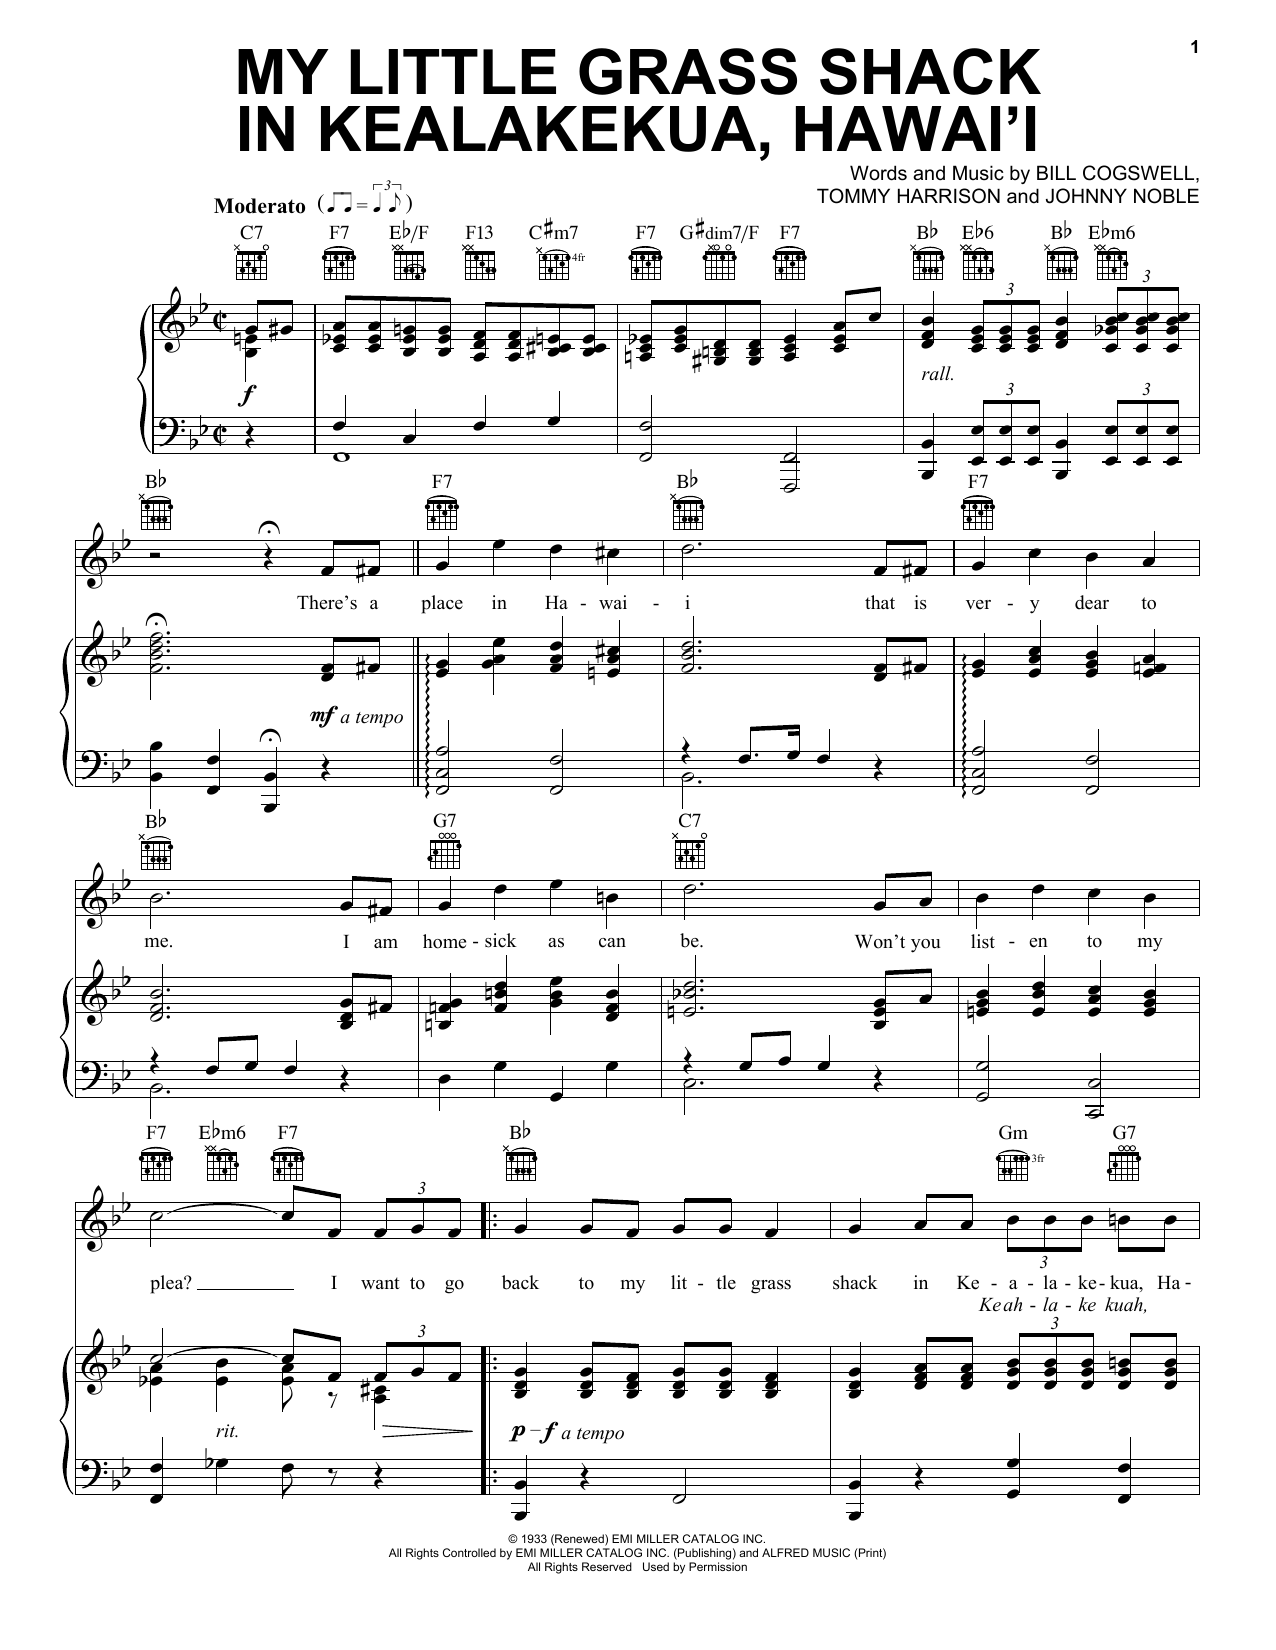 My Little Grass Shack In Kealakekua, Hawaii (Piano, Vocal & Guitar (Right-Hand Melody))